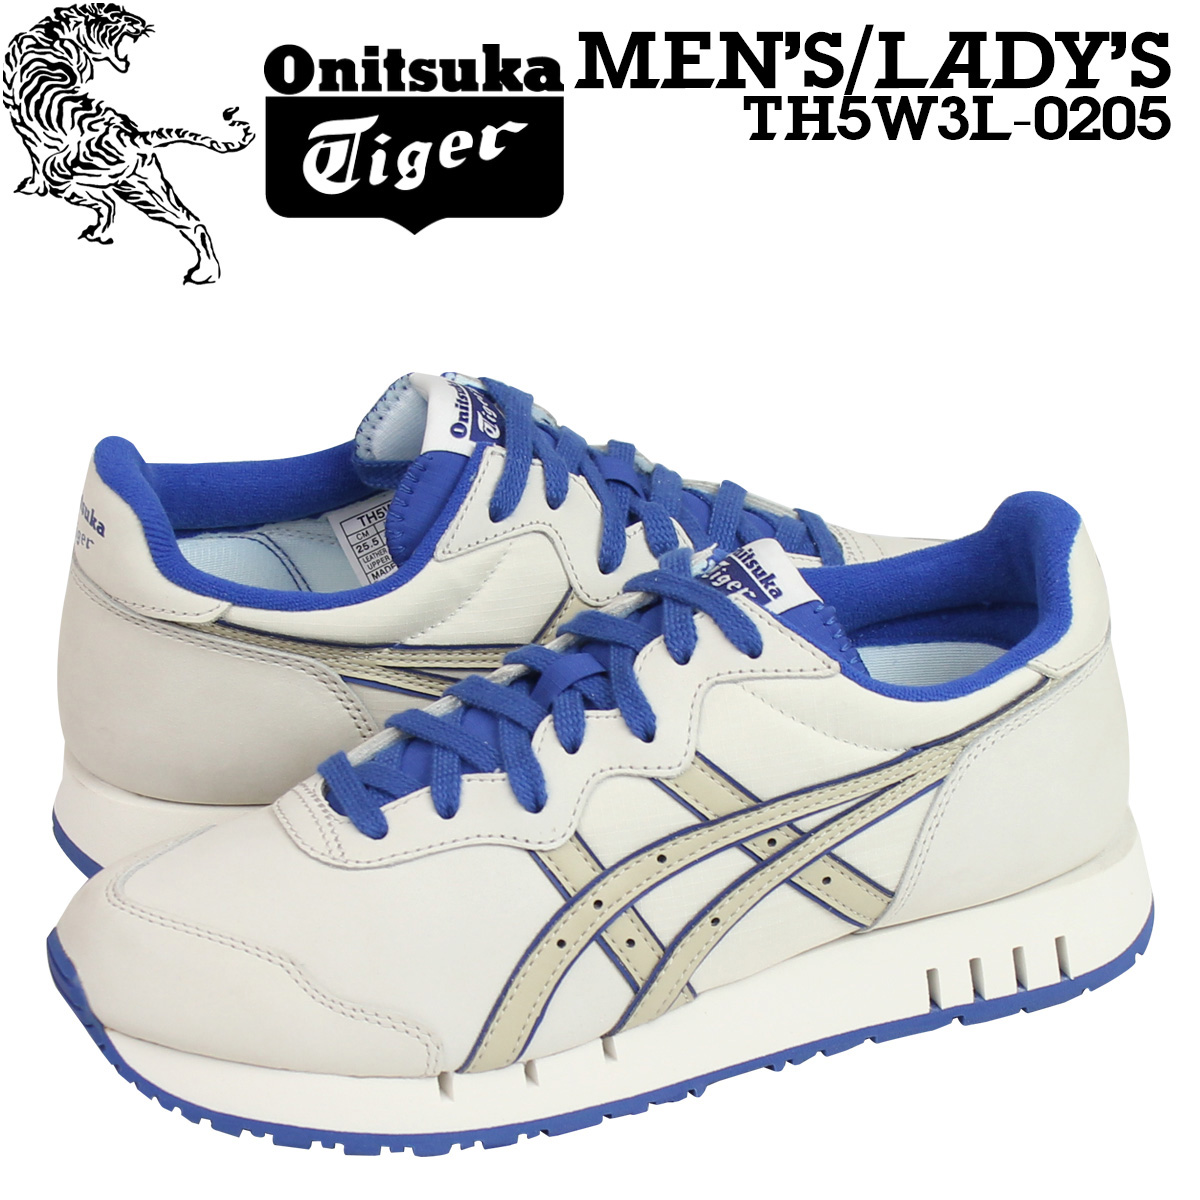 7e59b2d6c0 ALLSPORTS  Onitsuka Tiger ASICs Onitsuka Tiger asics men s women s X ...